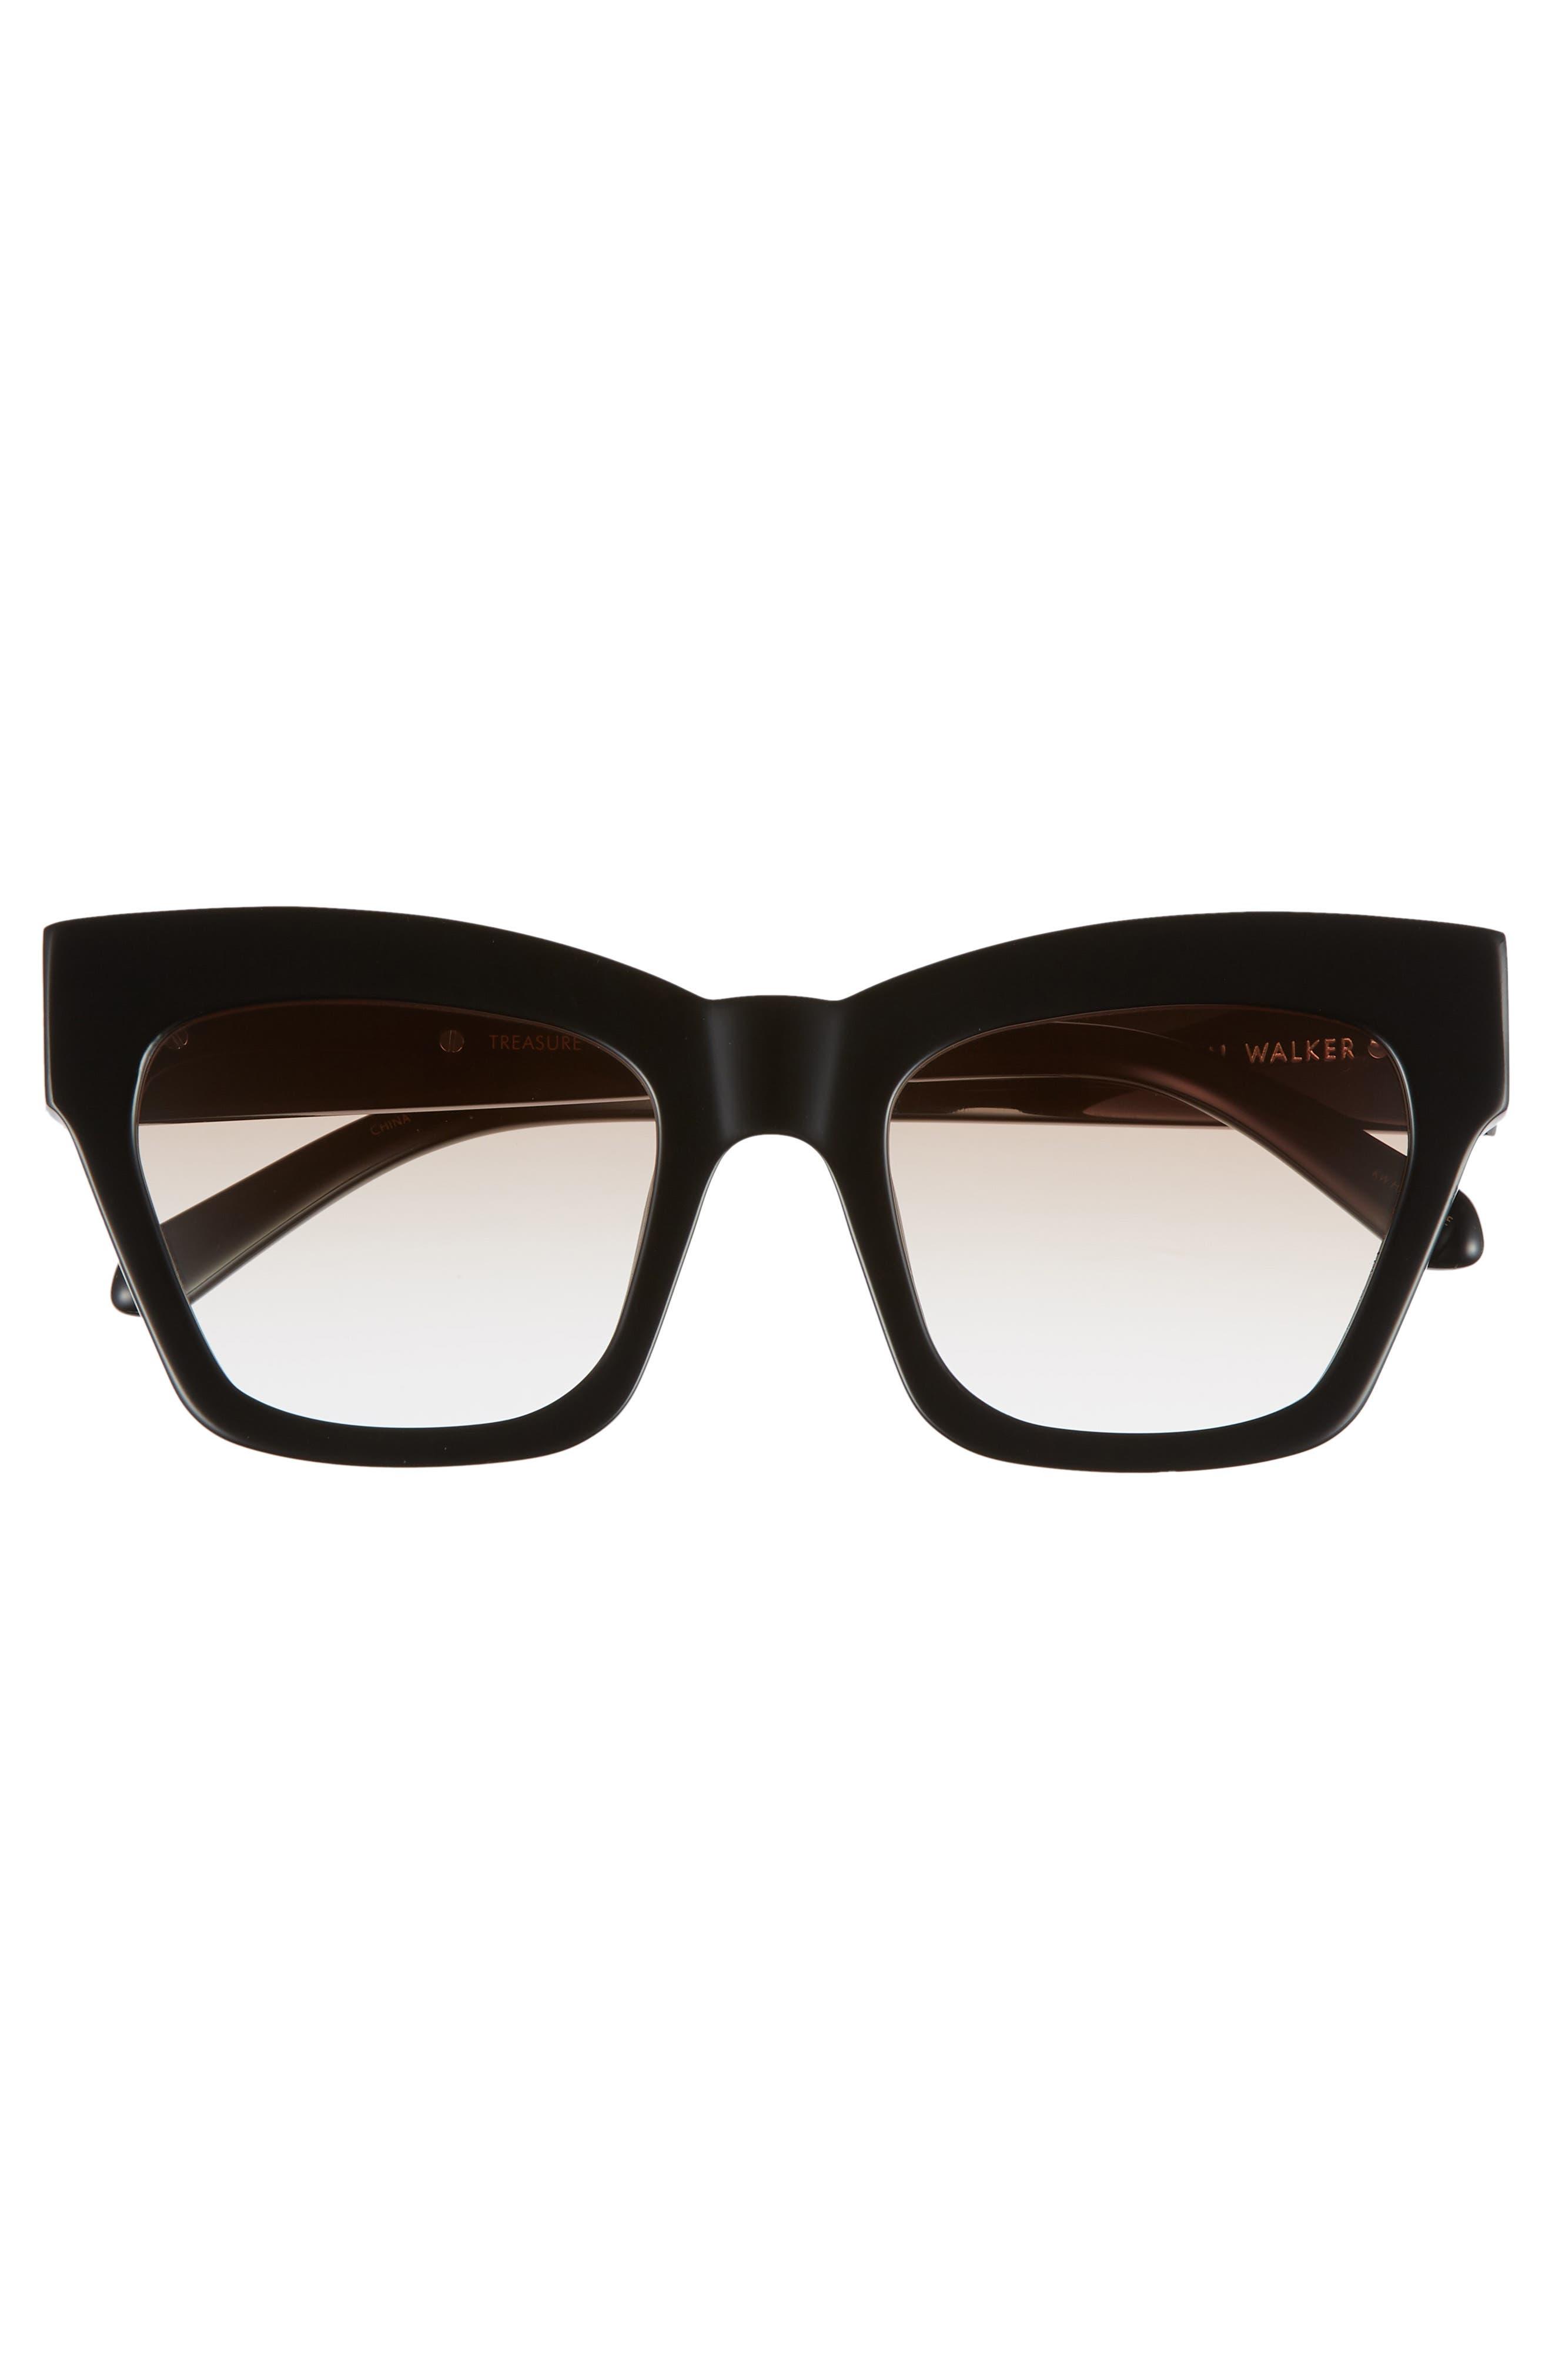 Treasure 52mm Cat Eye Sunglasses,                             Alternate thumbnail 3, color,                             Shiny Black/ Brown